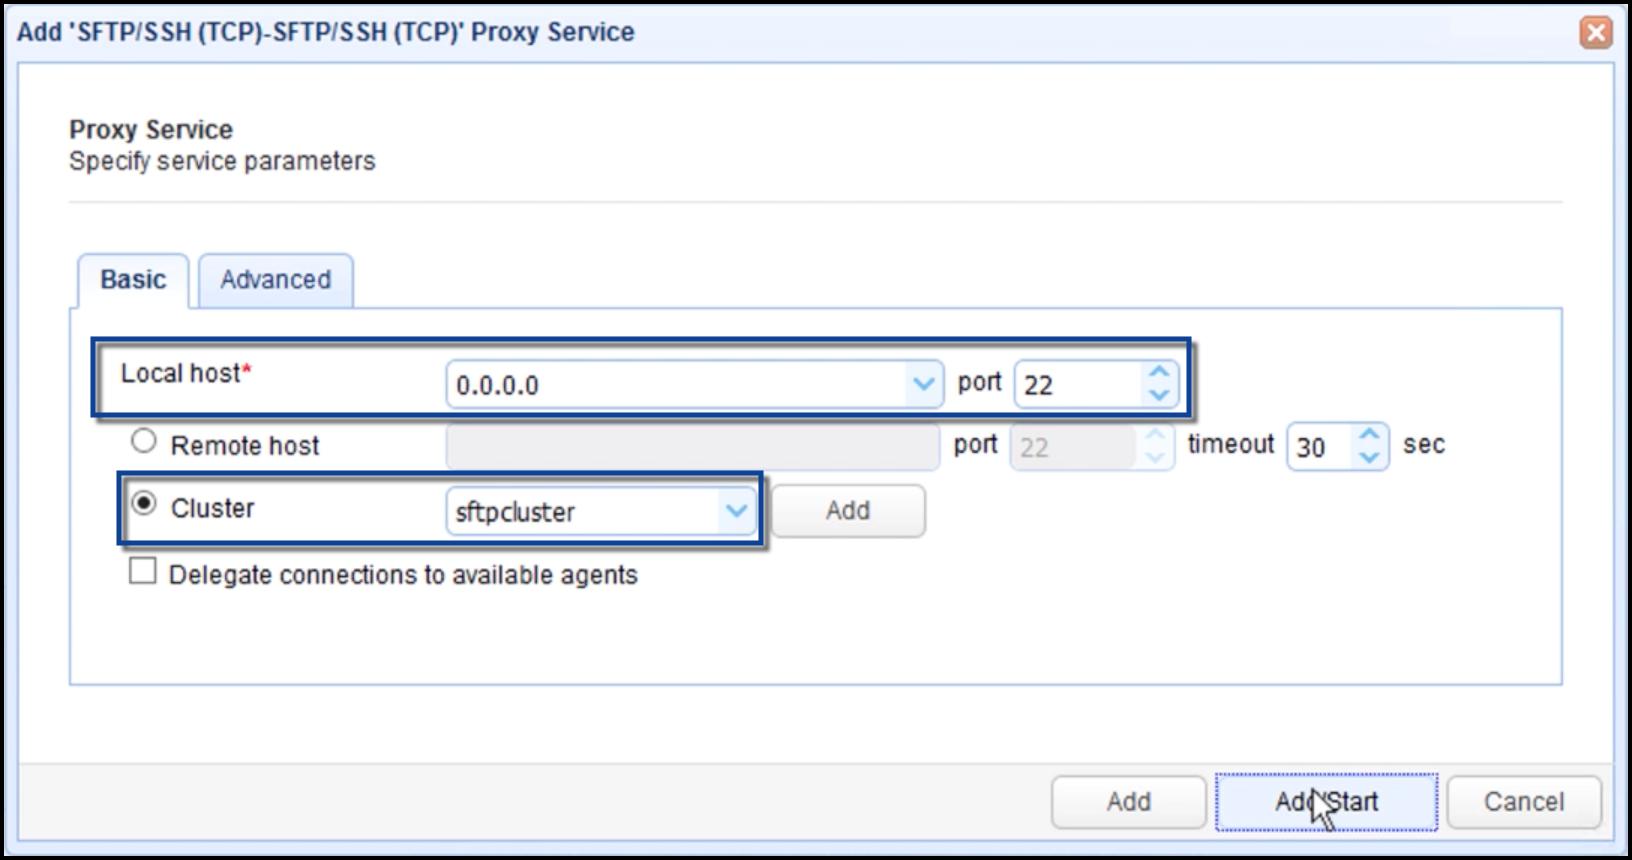 add proxy service parameters